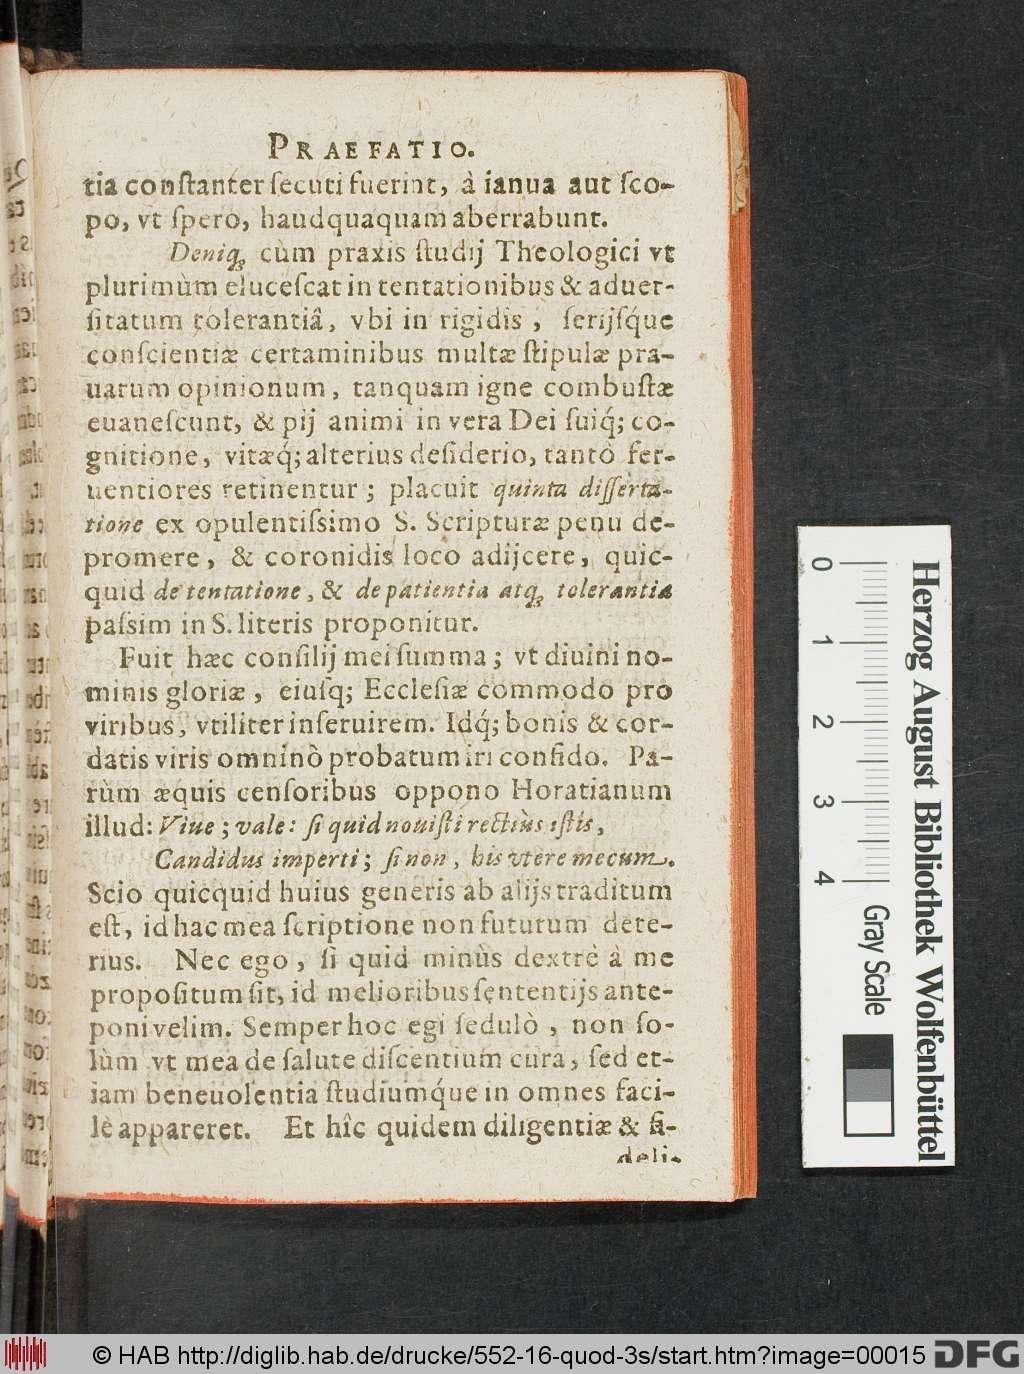 http://diglib.hab.de/drucke/552-16-quod-3s/00015.jpg